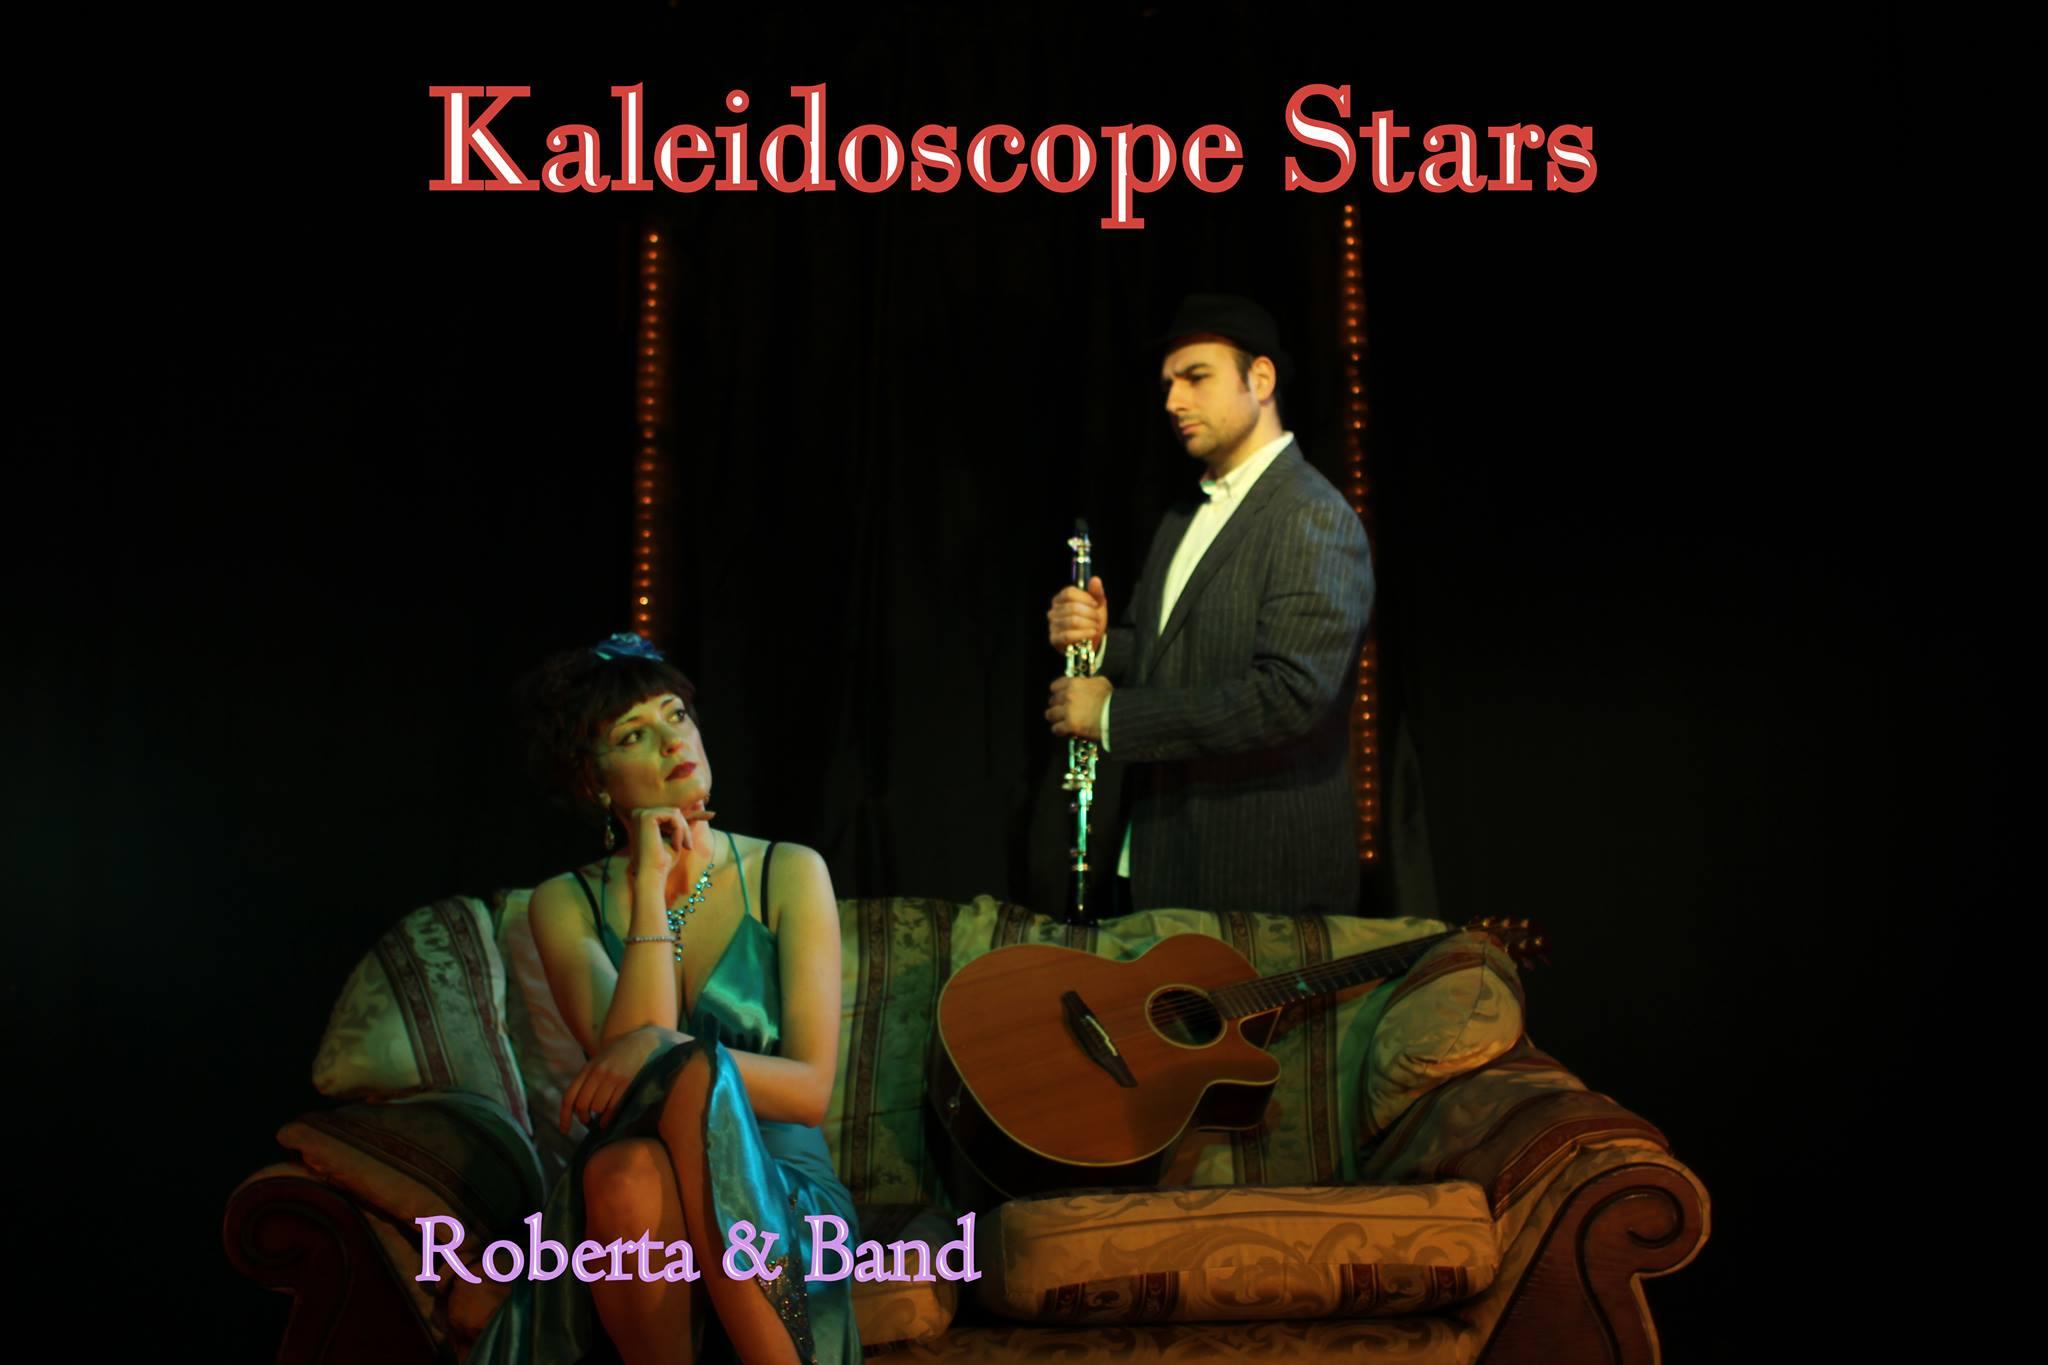 Roberta De Francia & Band – Kaleidoscope Stars